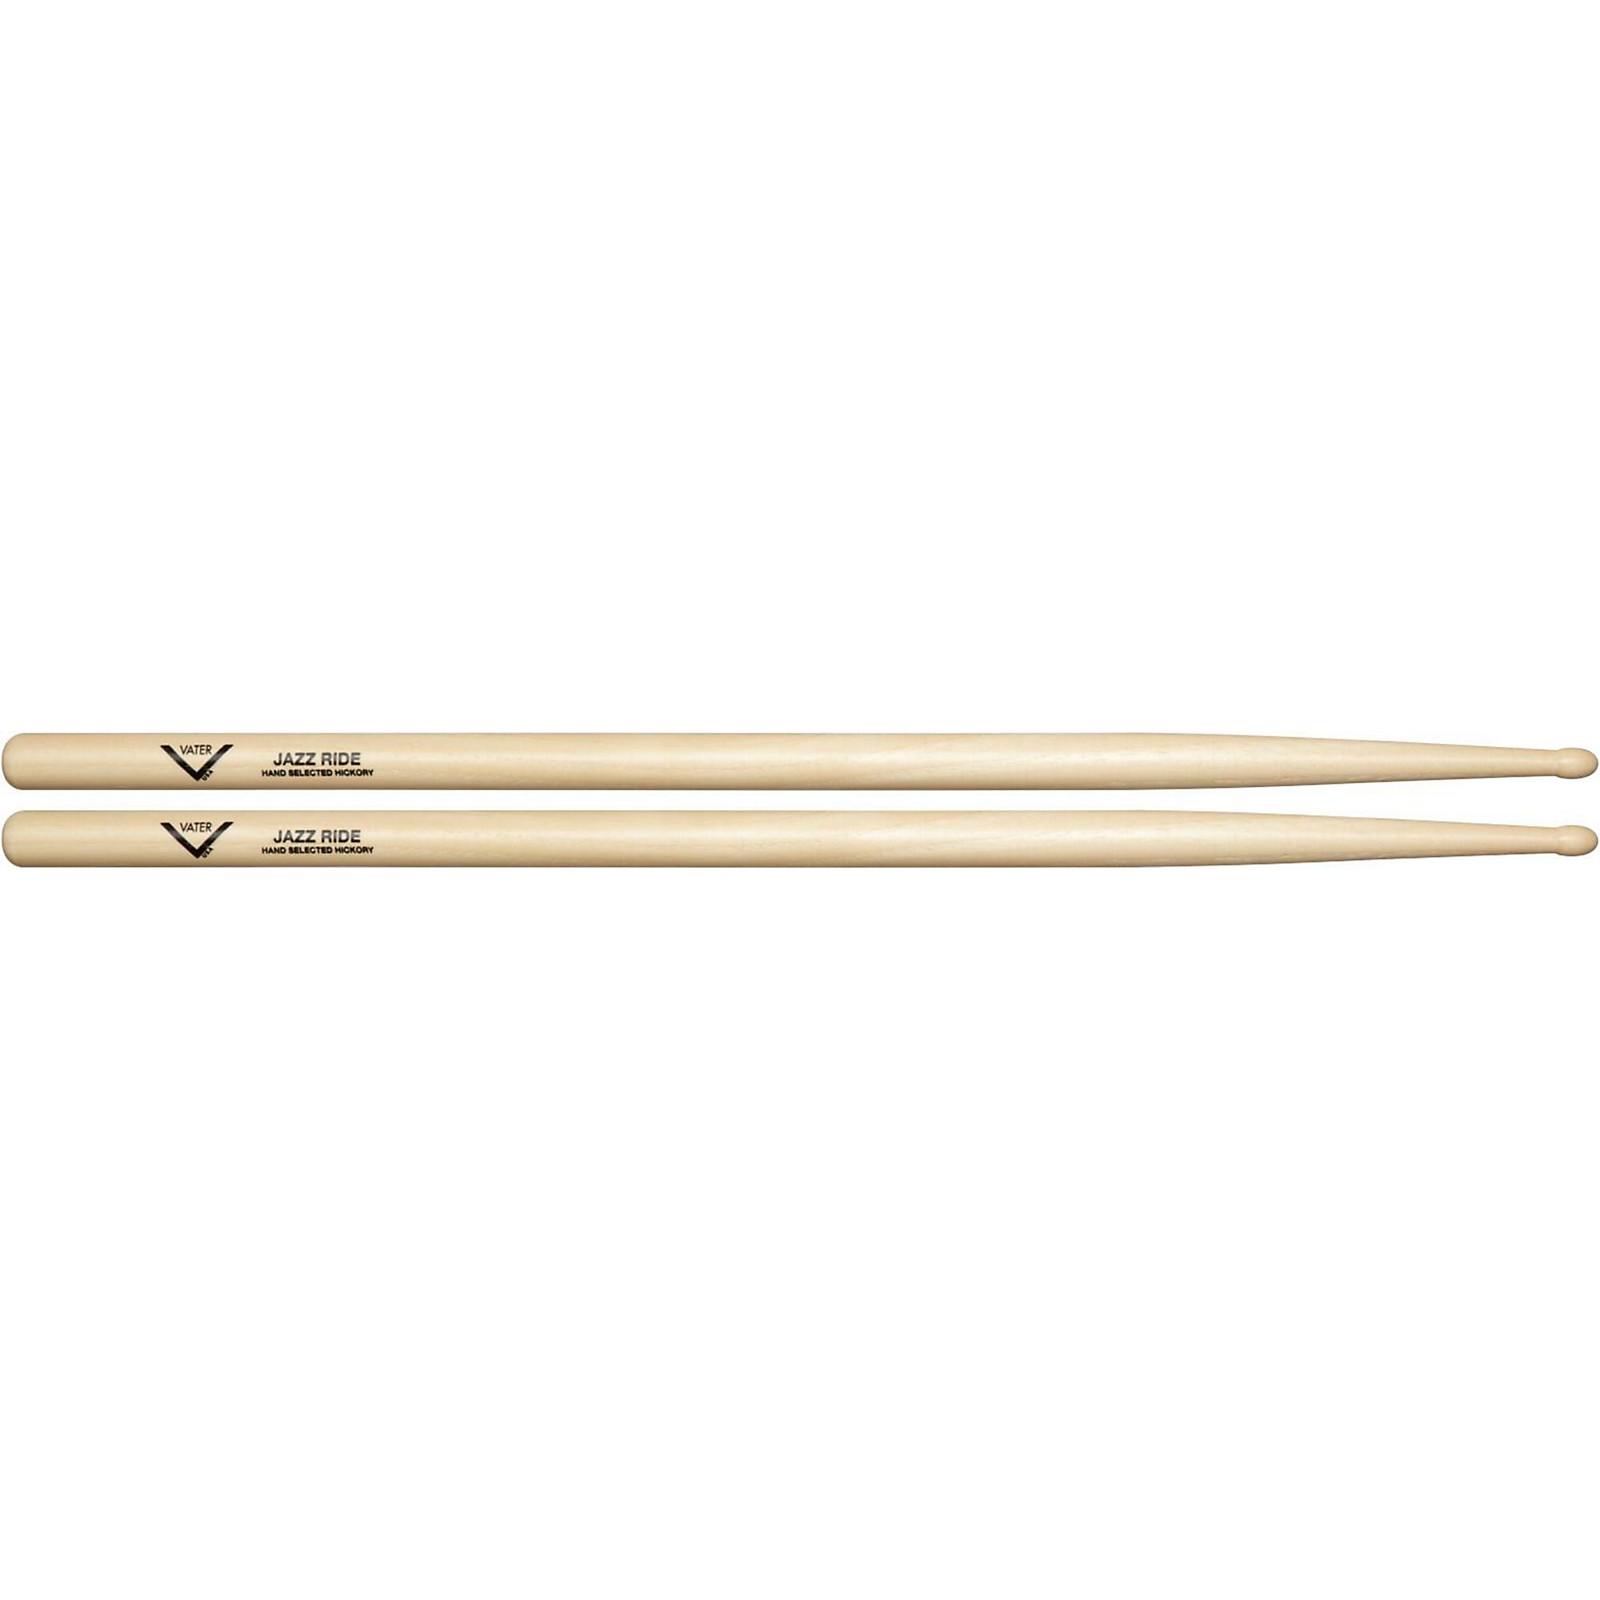 Vater American Hickory Jazz Ride Drumsticks